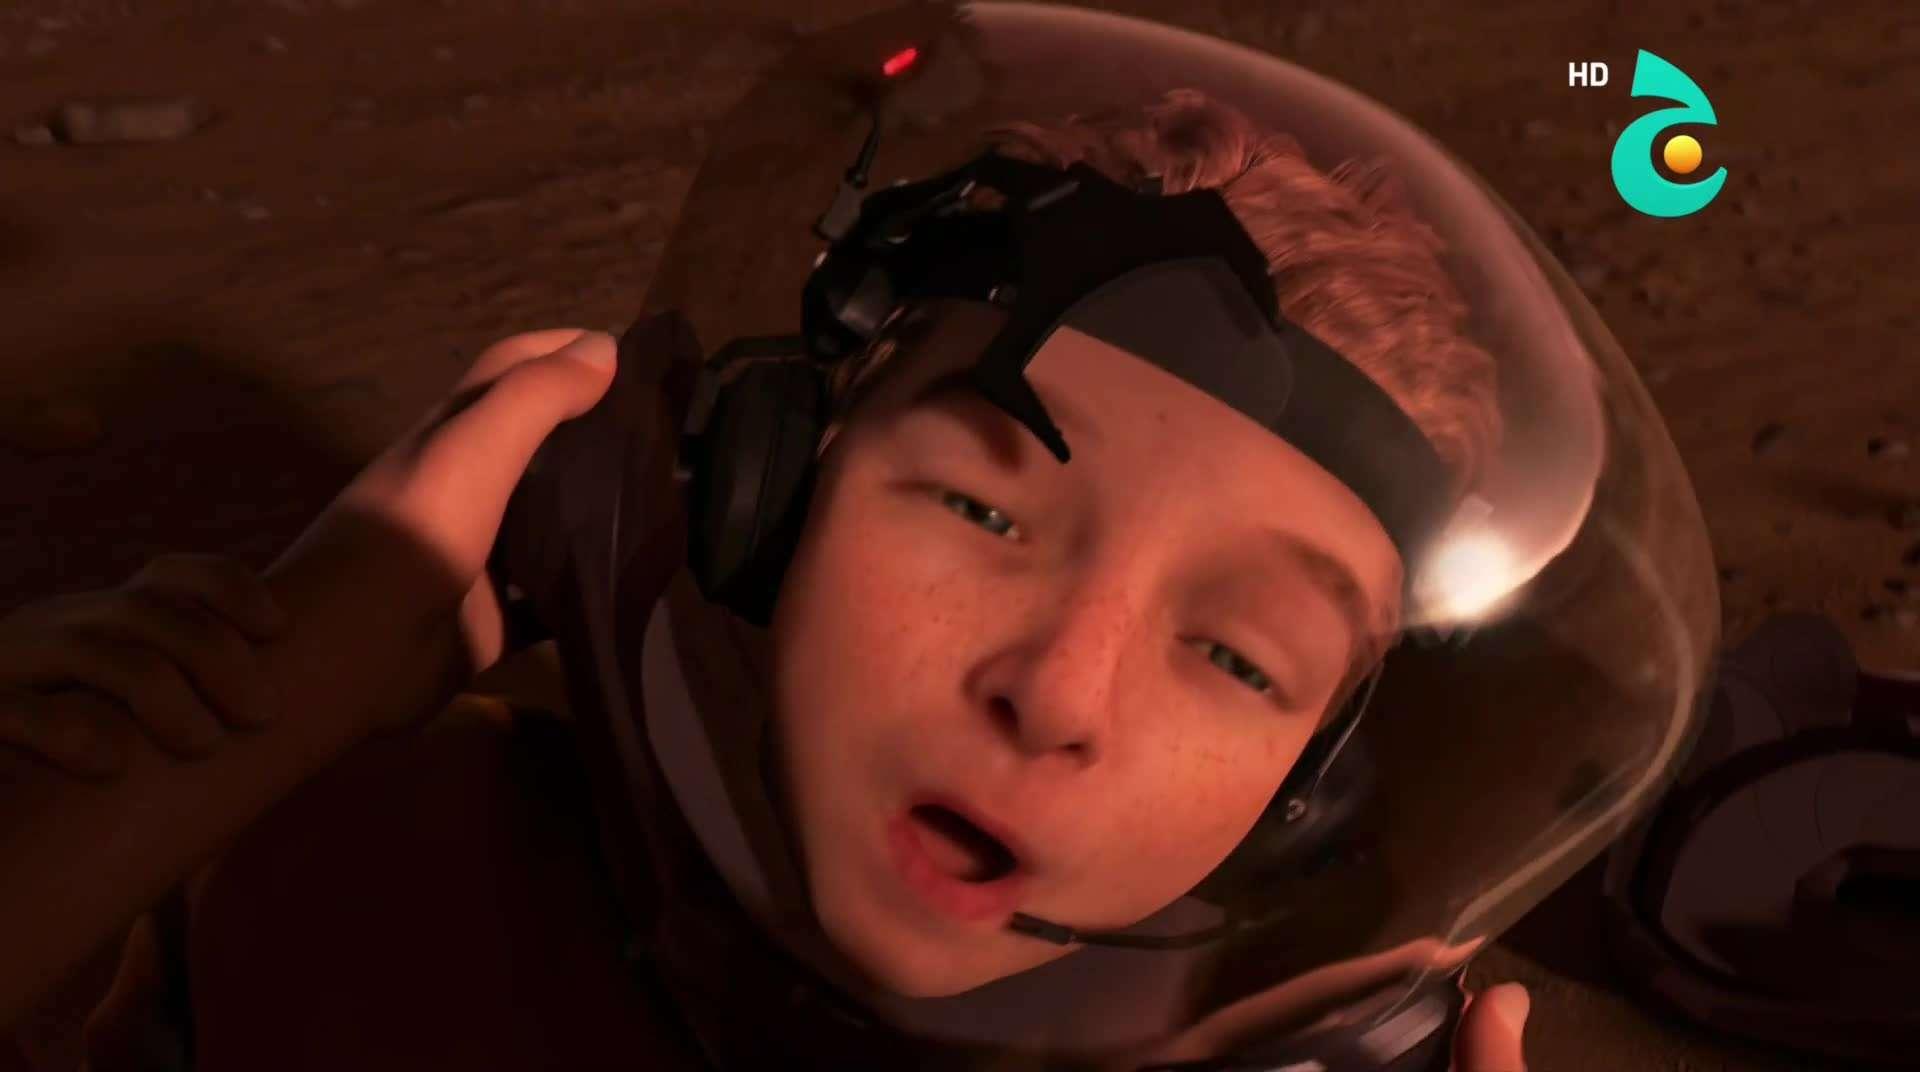 ميلو ورحلة الانقاذ Mars Needs Moms (2011) HDTV 1080p تحميل تورنت 16 arabp2p.com